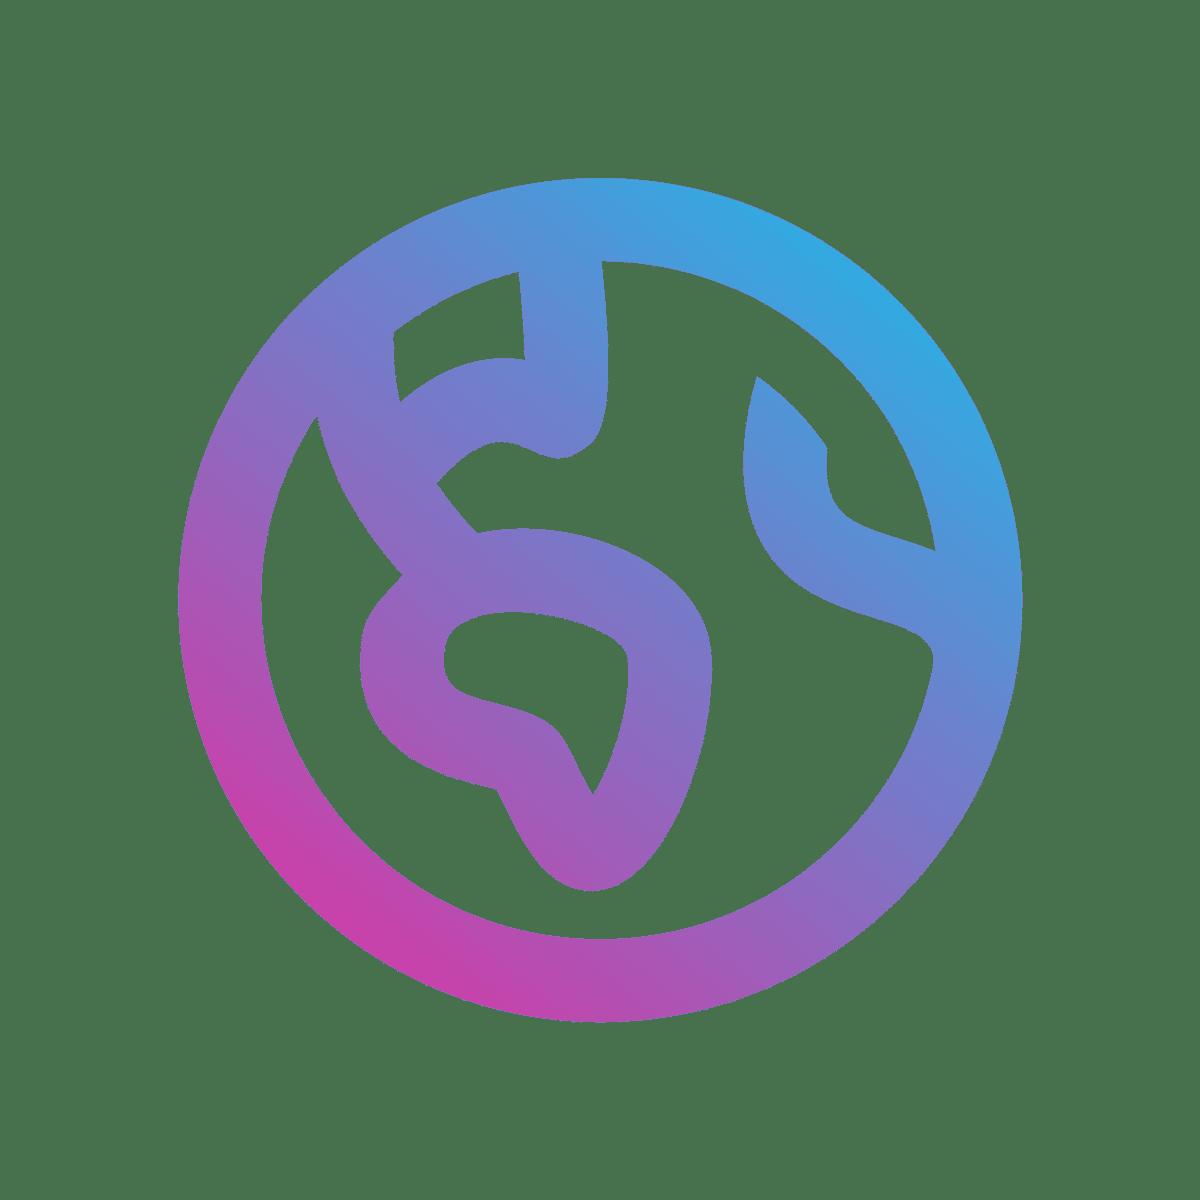 icon duurzaamheid